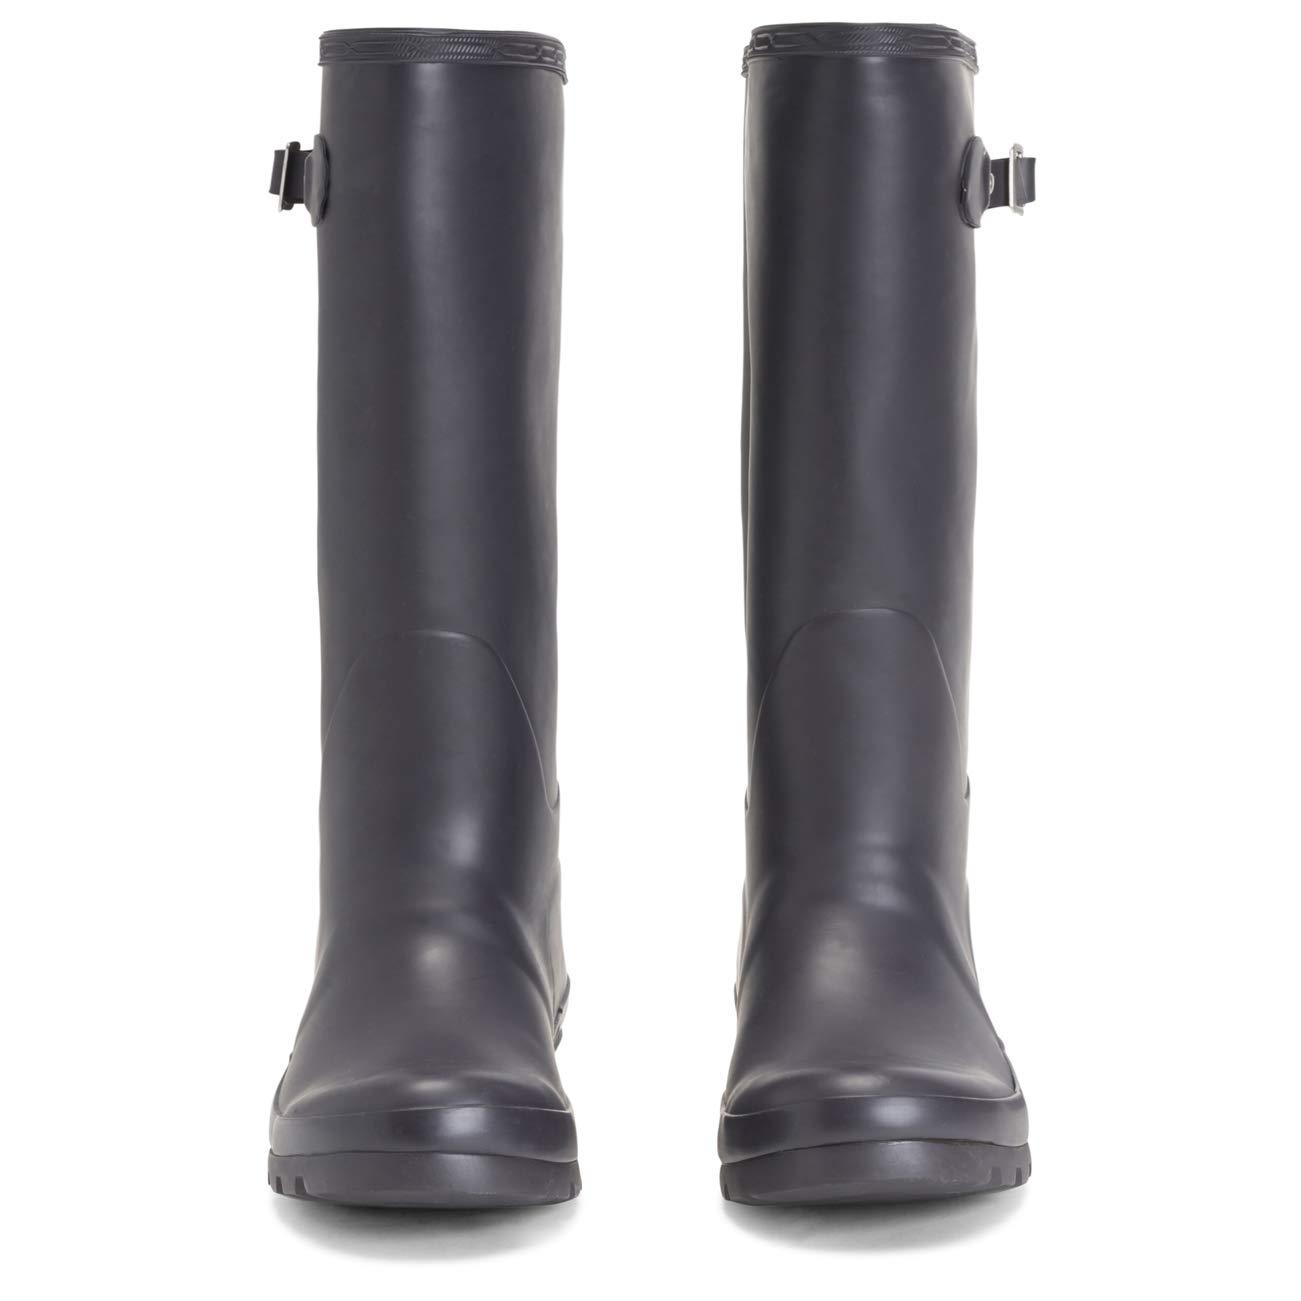 Womens Original Tall Snow Winter Waterproof Rain Wellies Wellington Boots